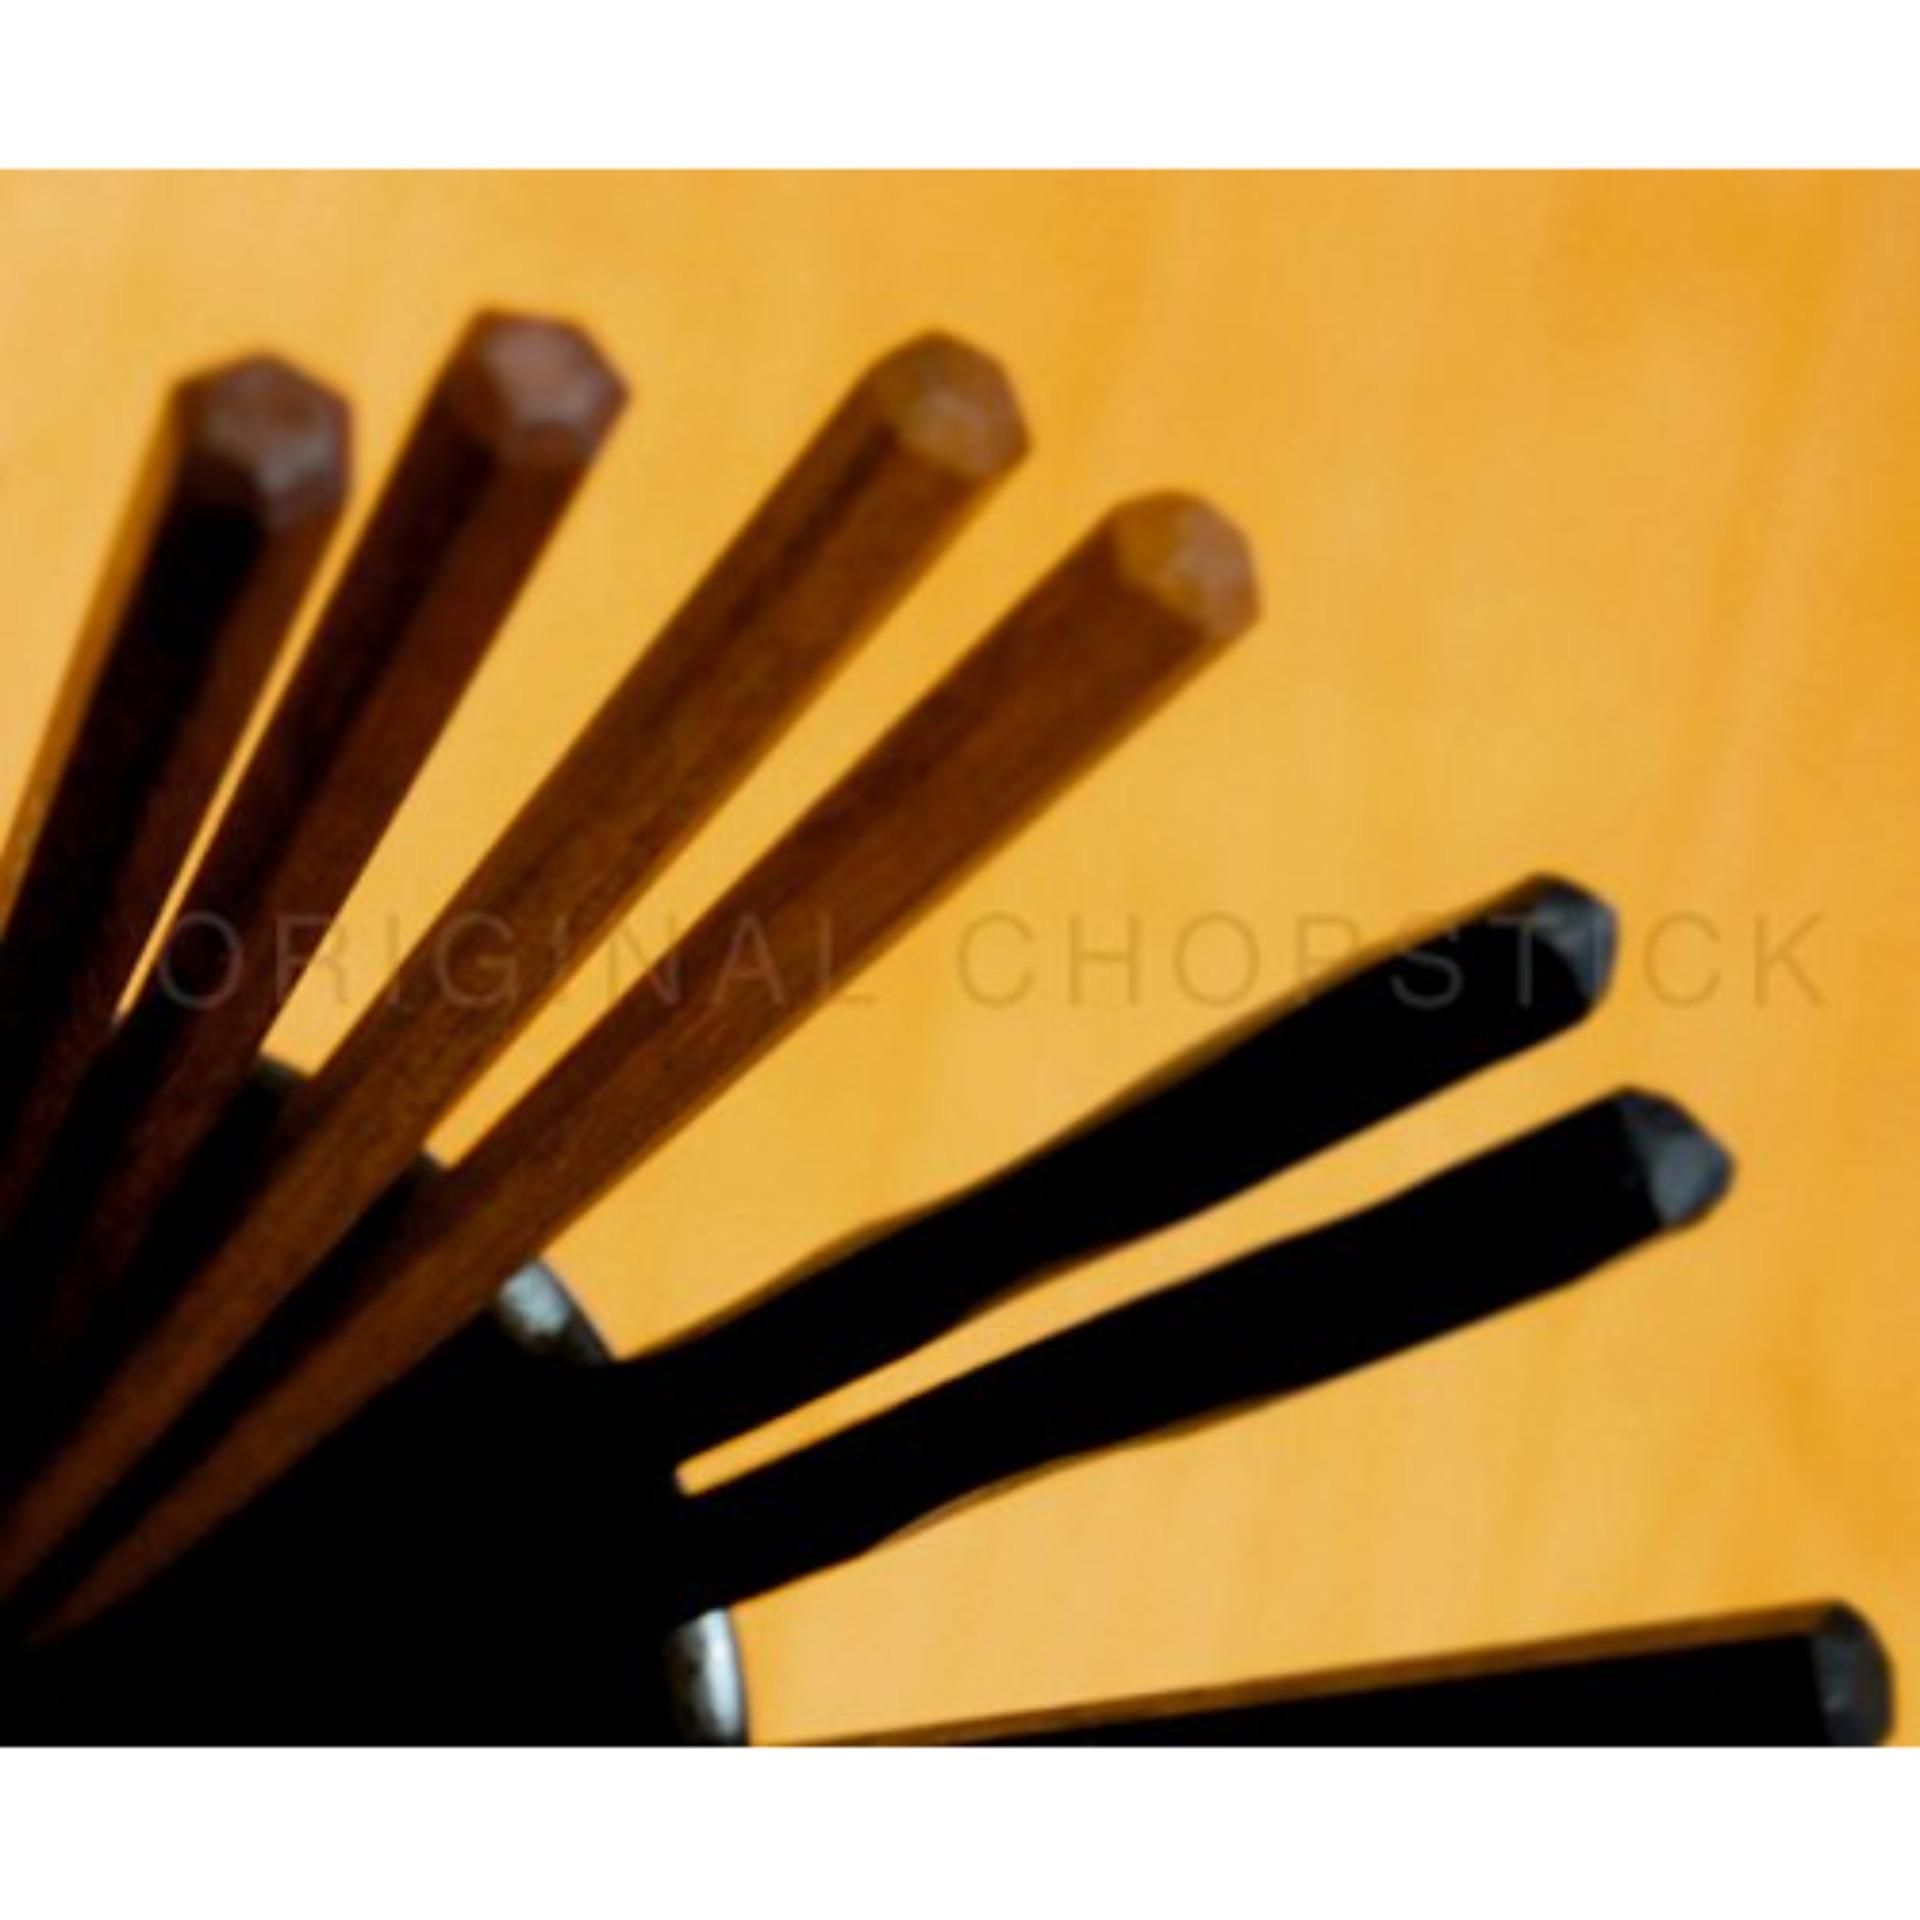 Đũa Japan chopsticks Nhật Bản